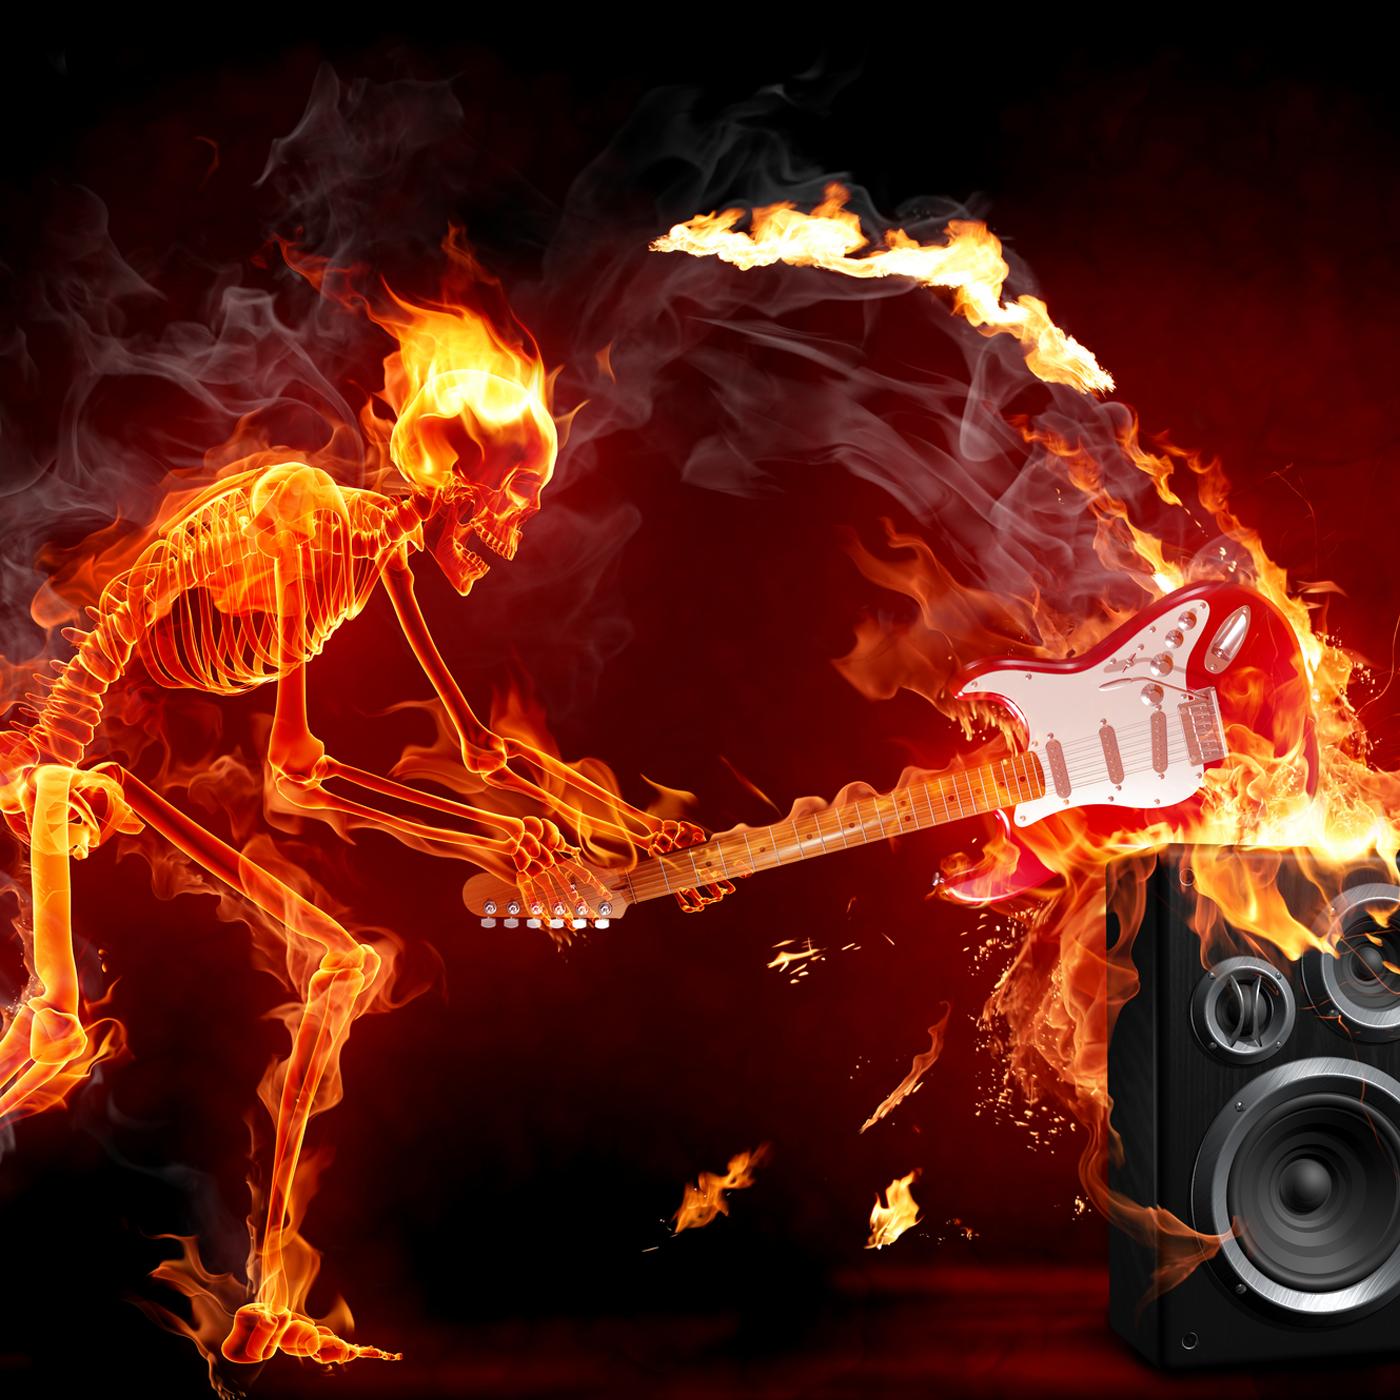 heavy metal on rockradio com rockradio com rock music for life